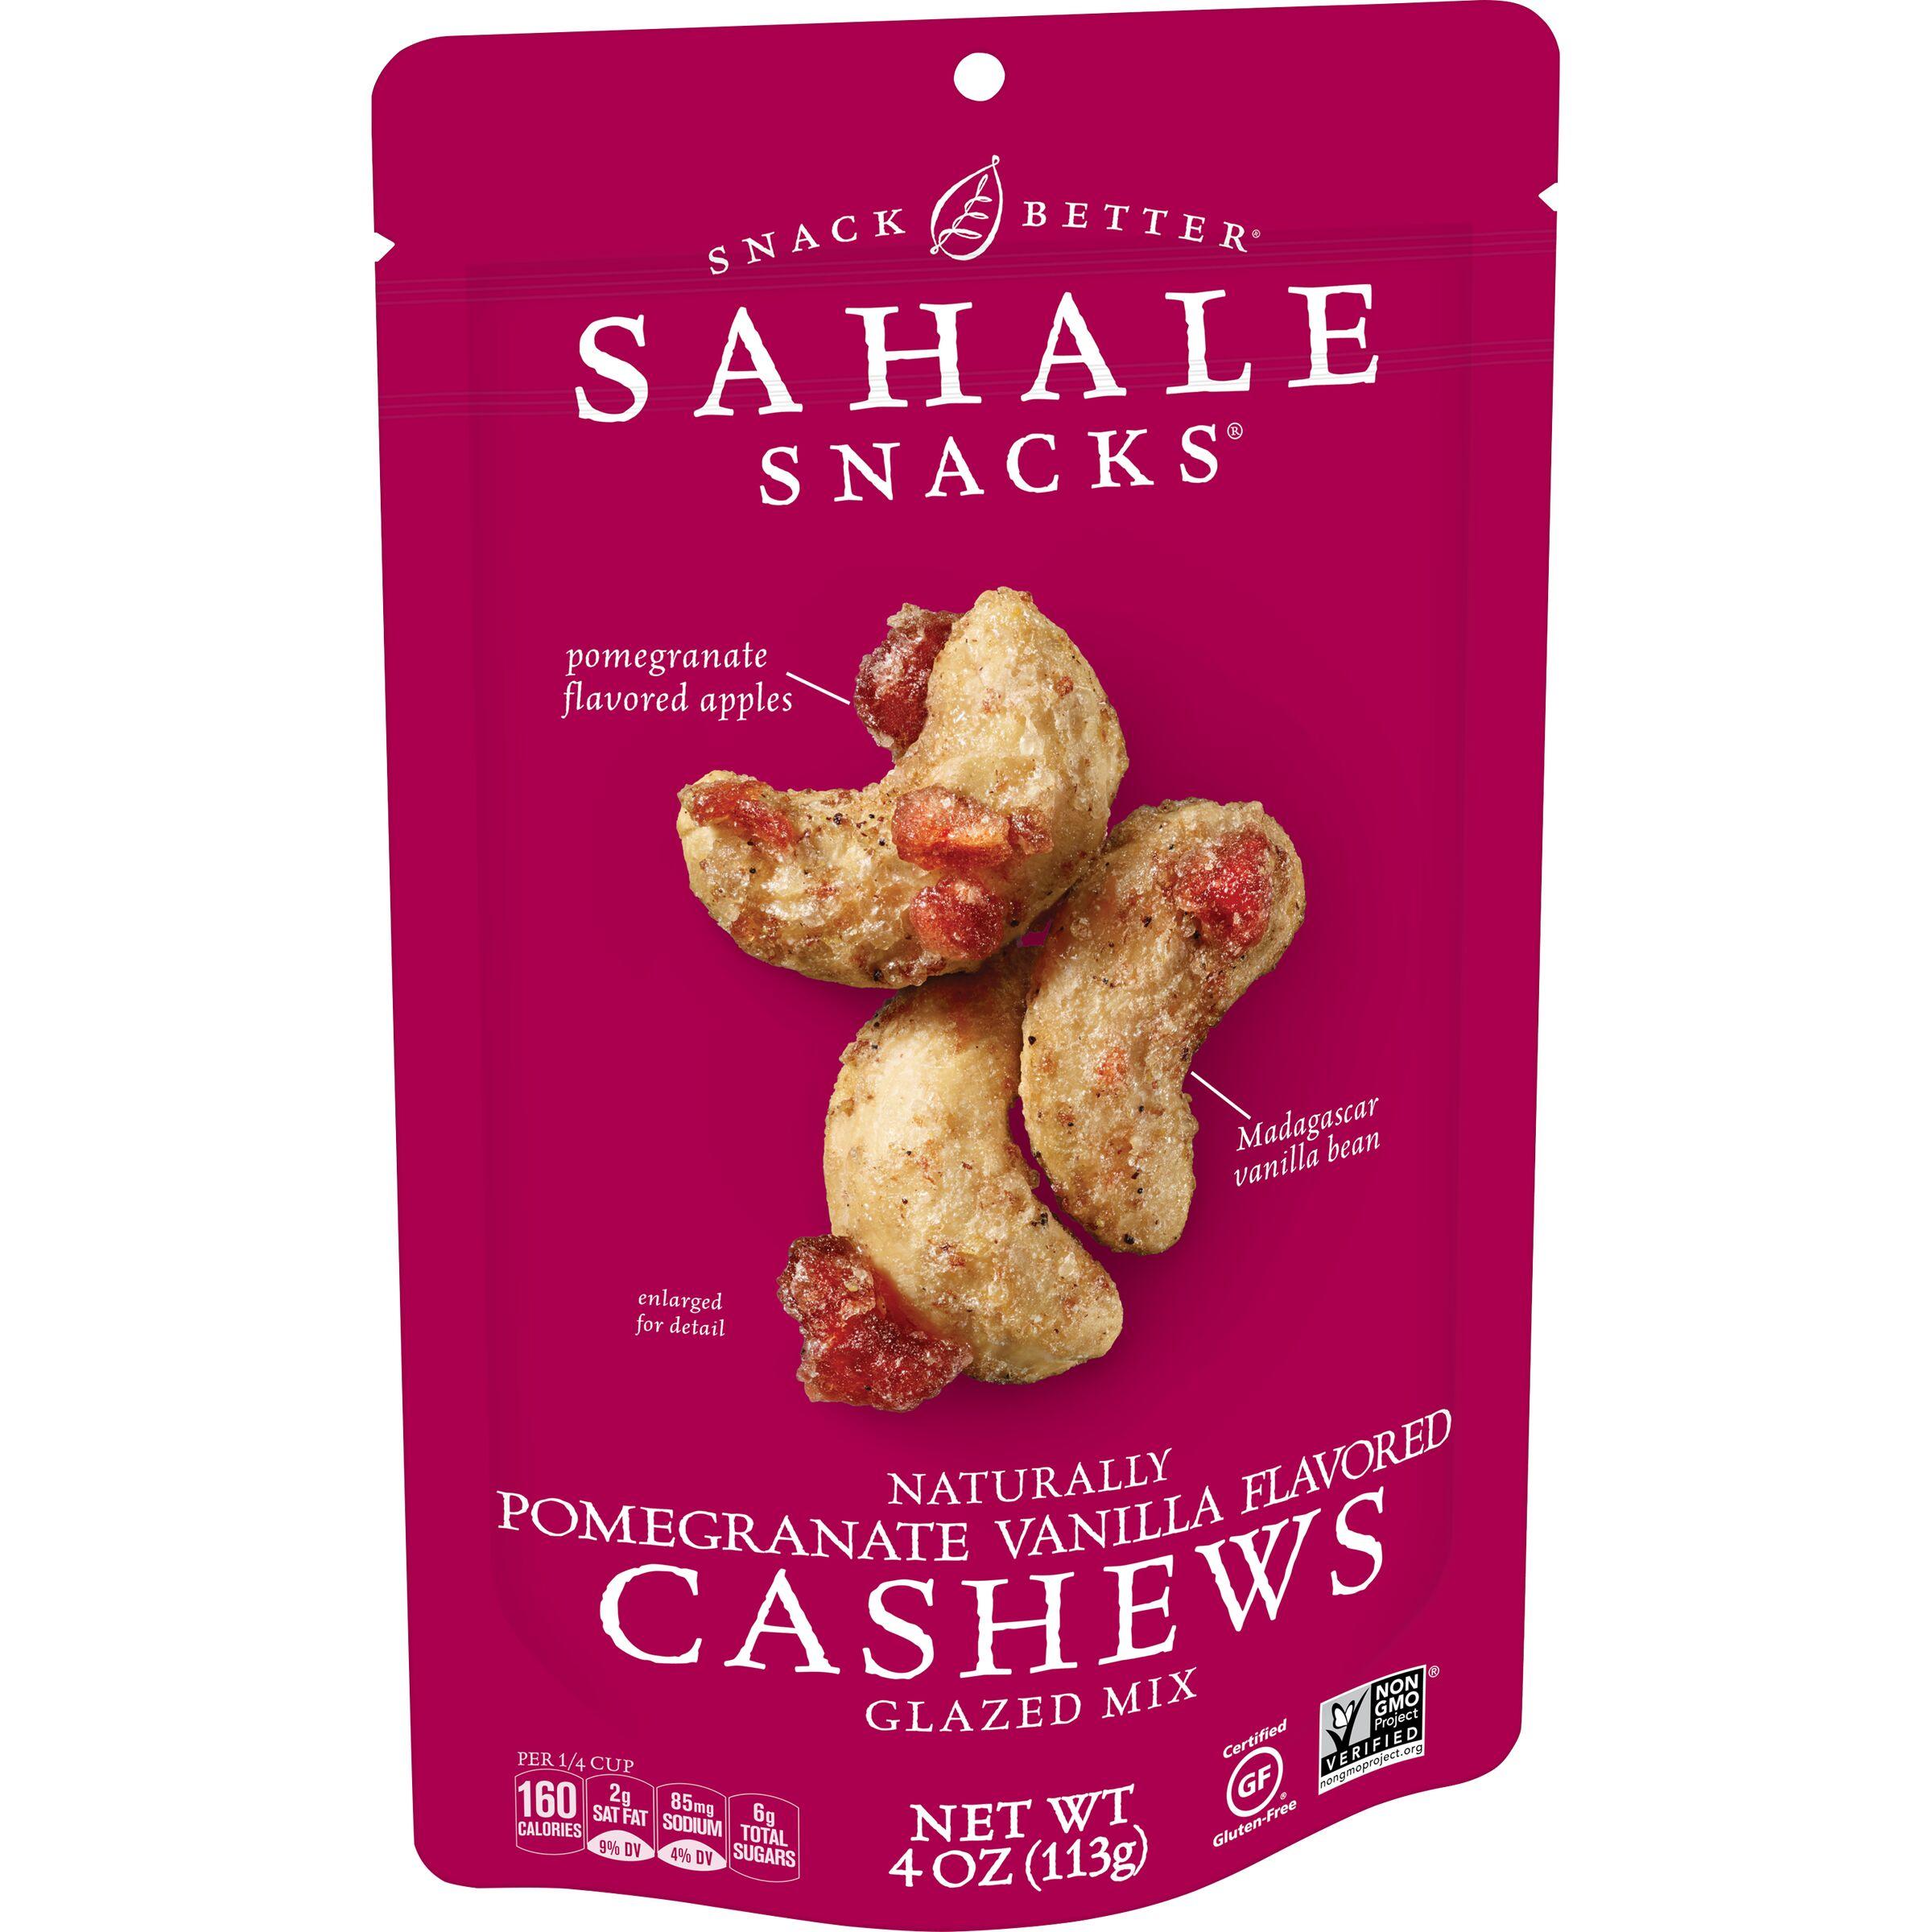 Sahale Snacks  Naturally Pomegranate Vanilla Flavored Cashews Glazed Mix